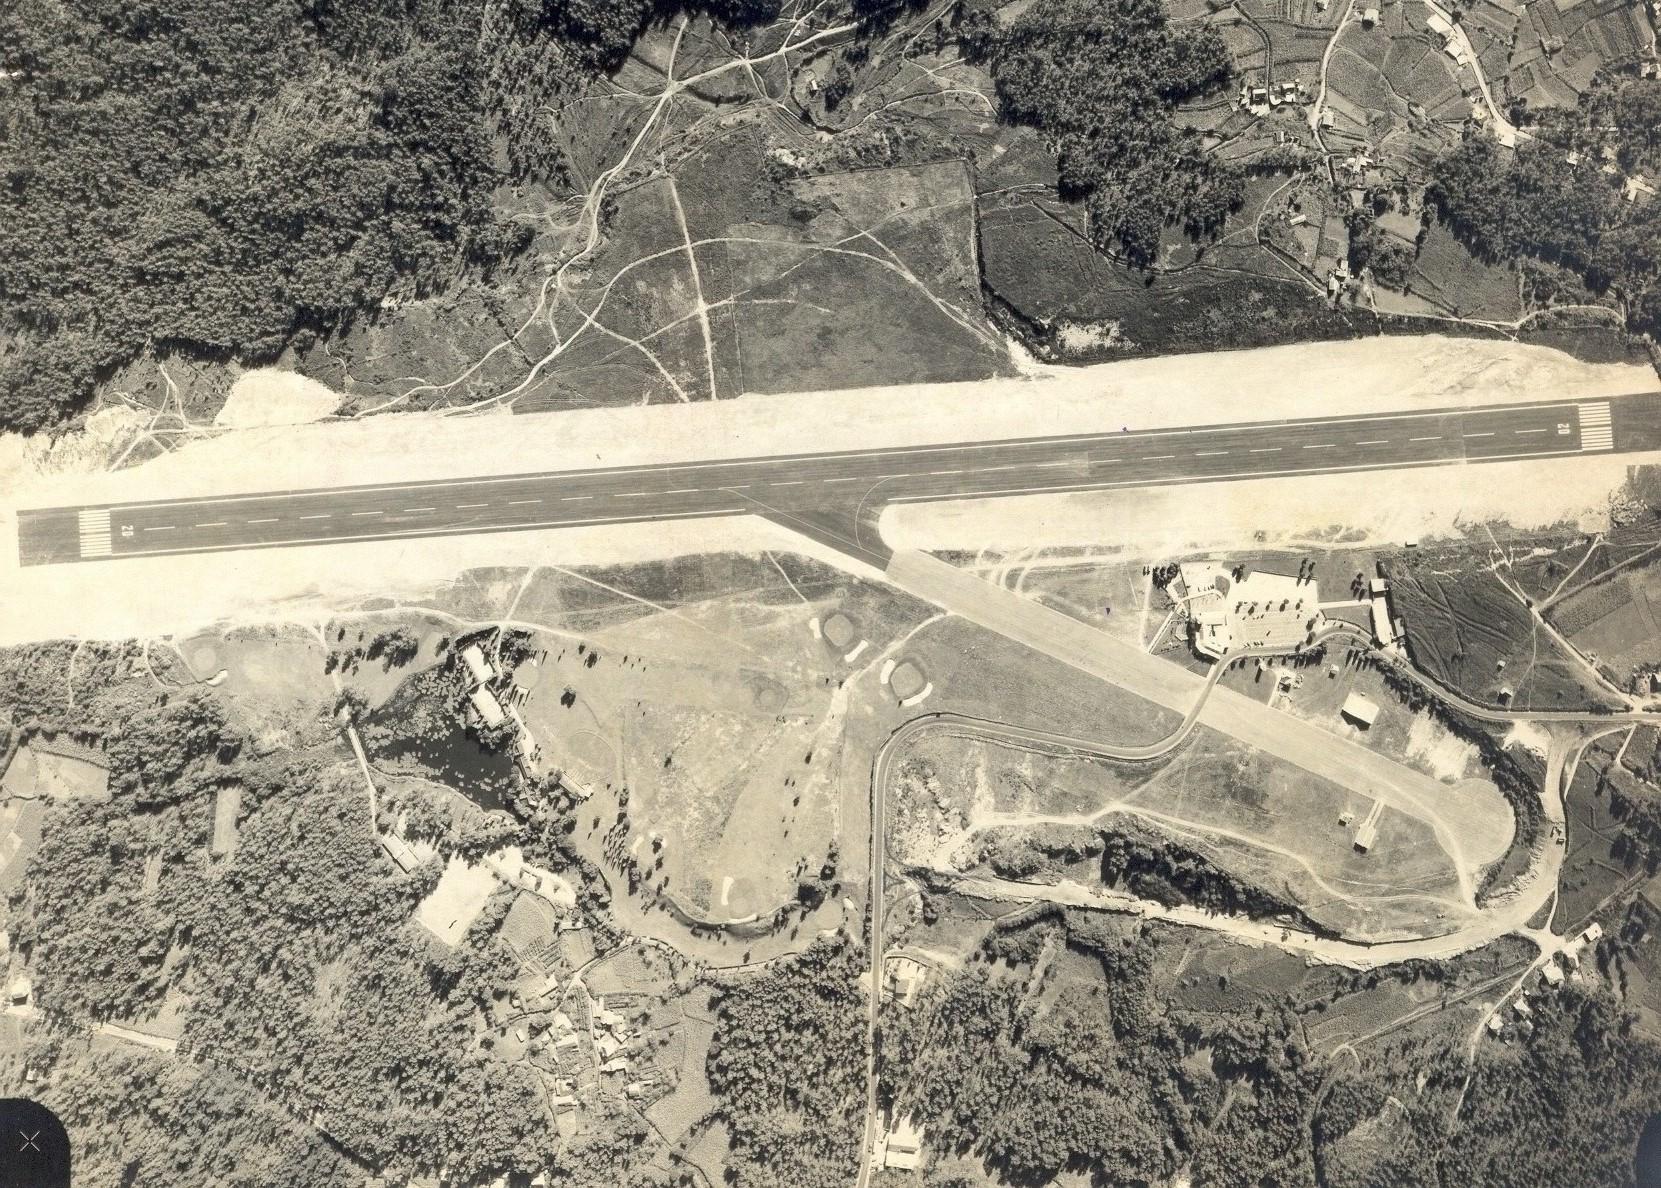 aerop. Foto aérea de Peinador